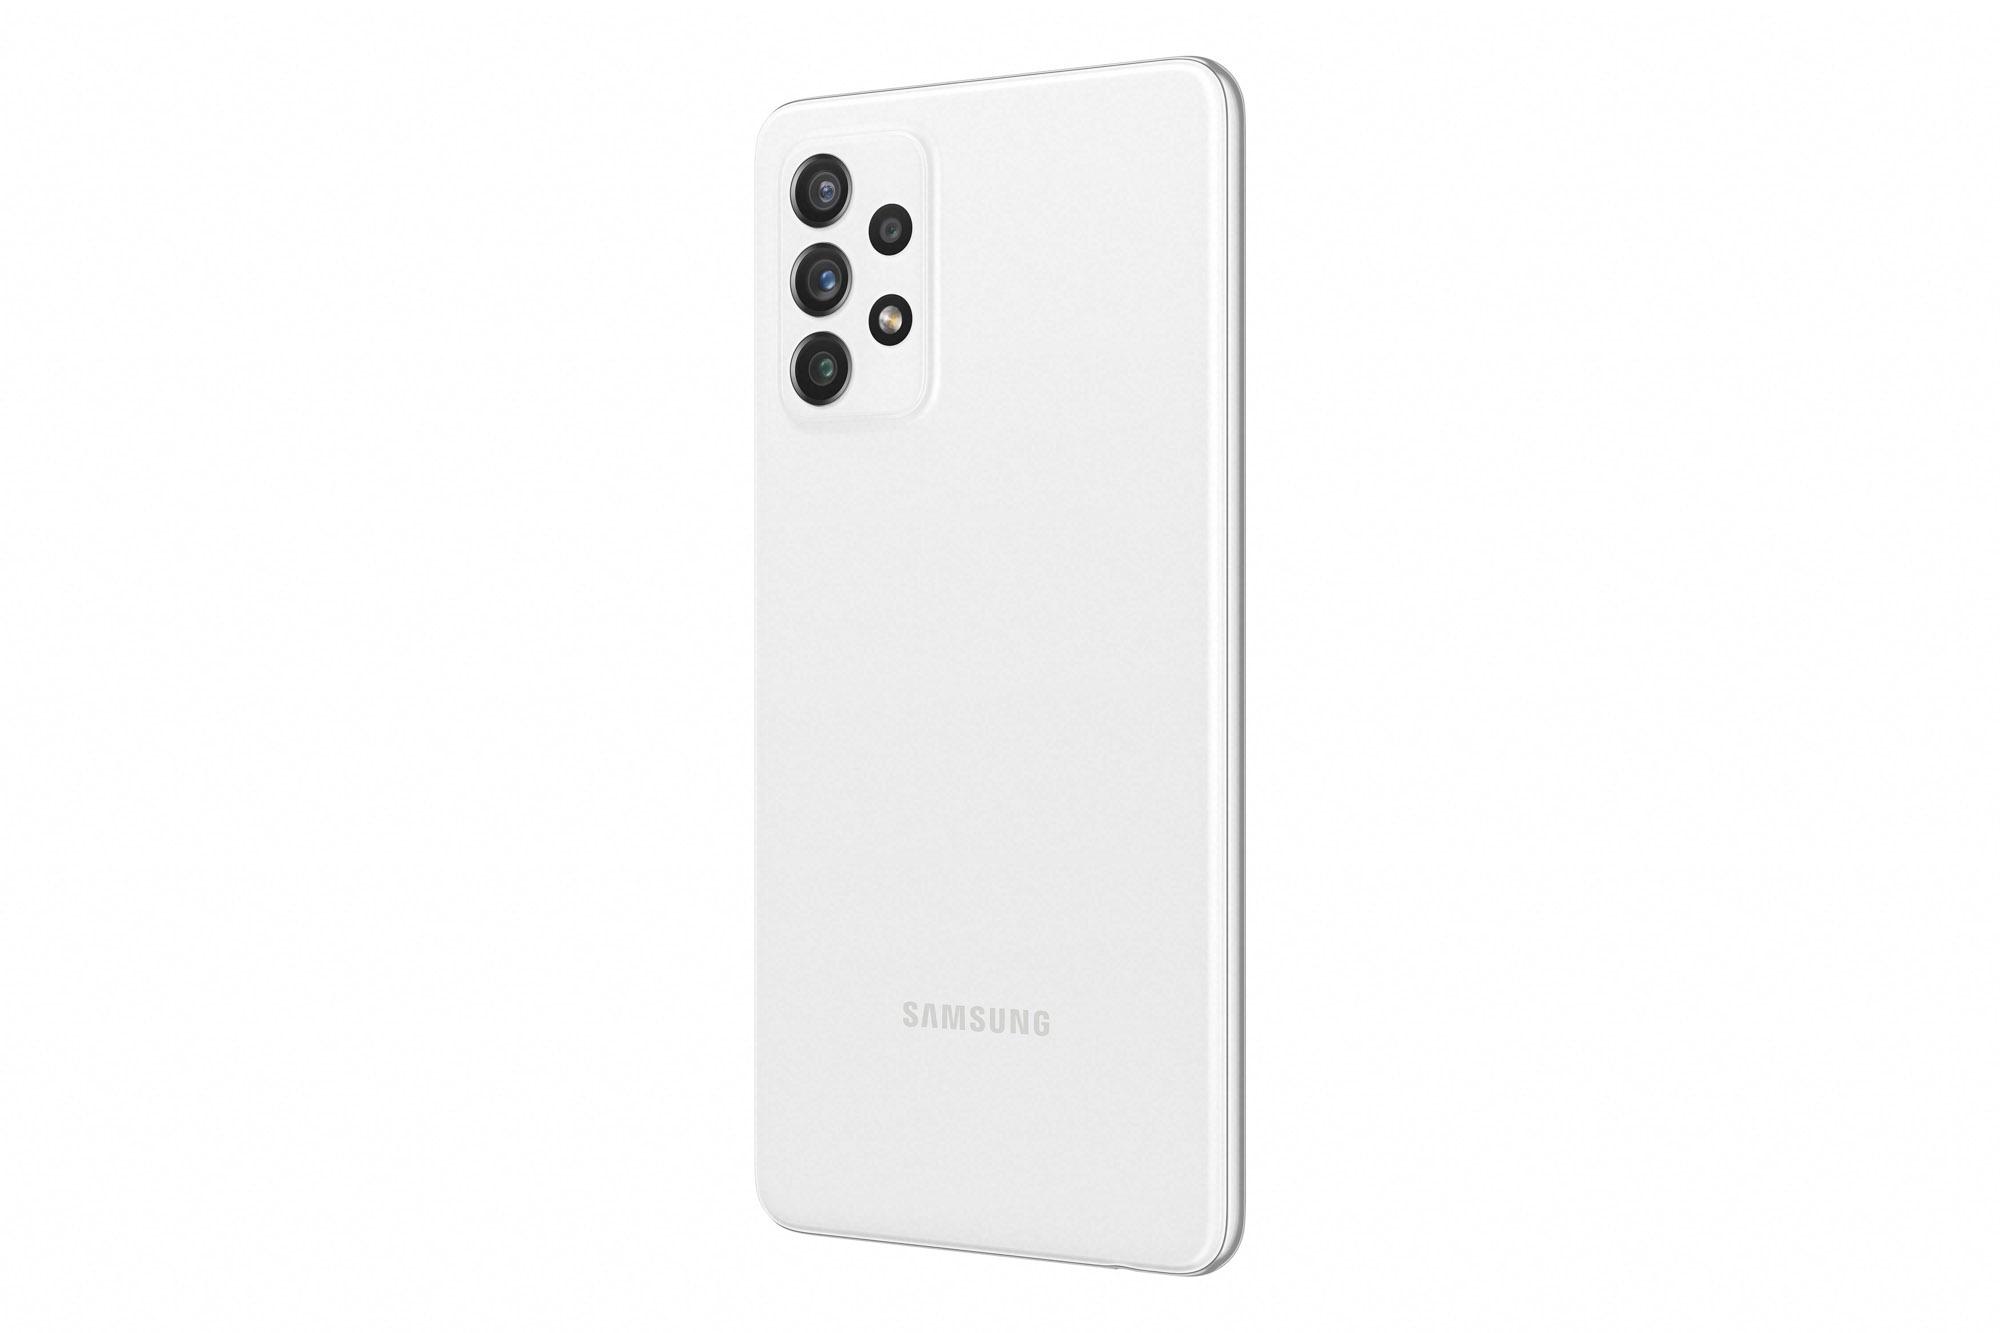 Samsung Galaxy A72 - Official Look